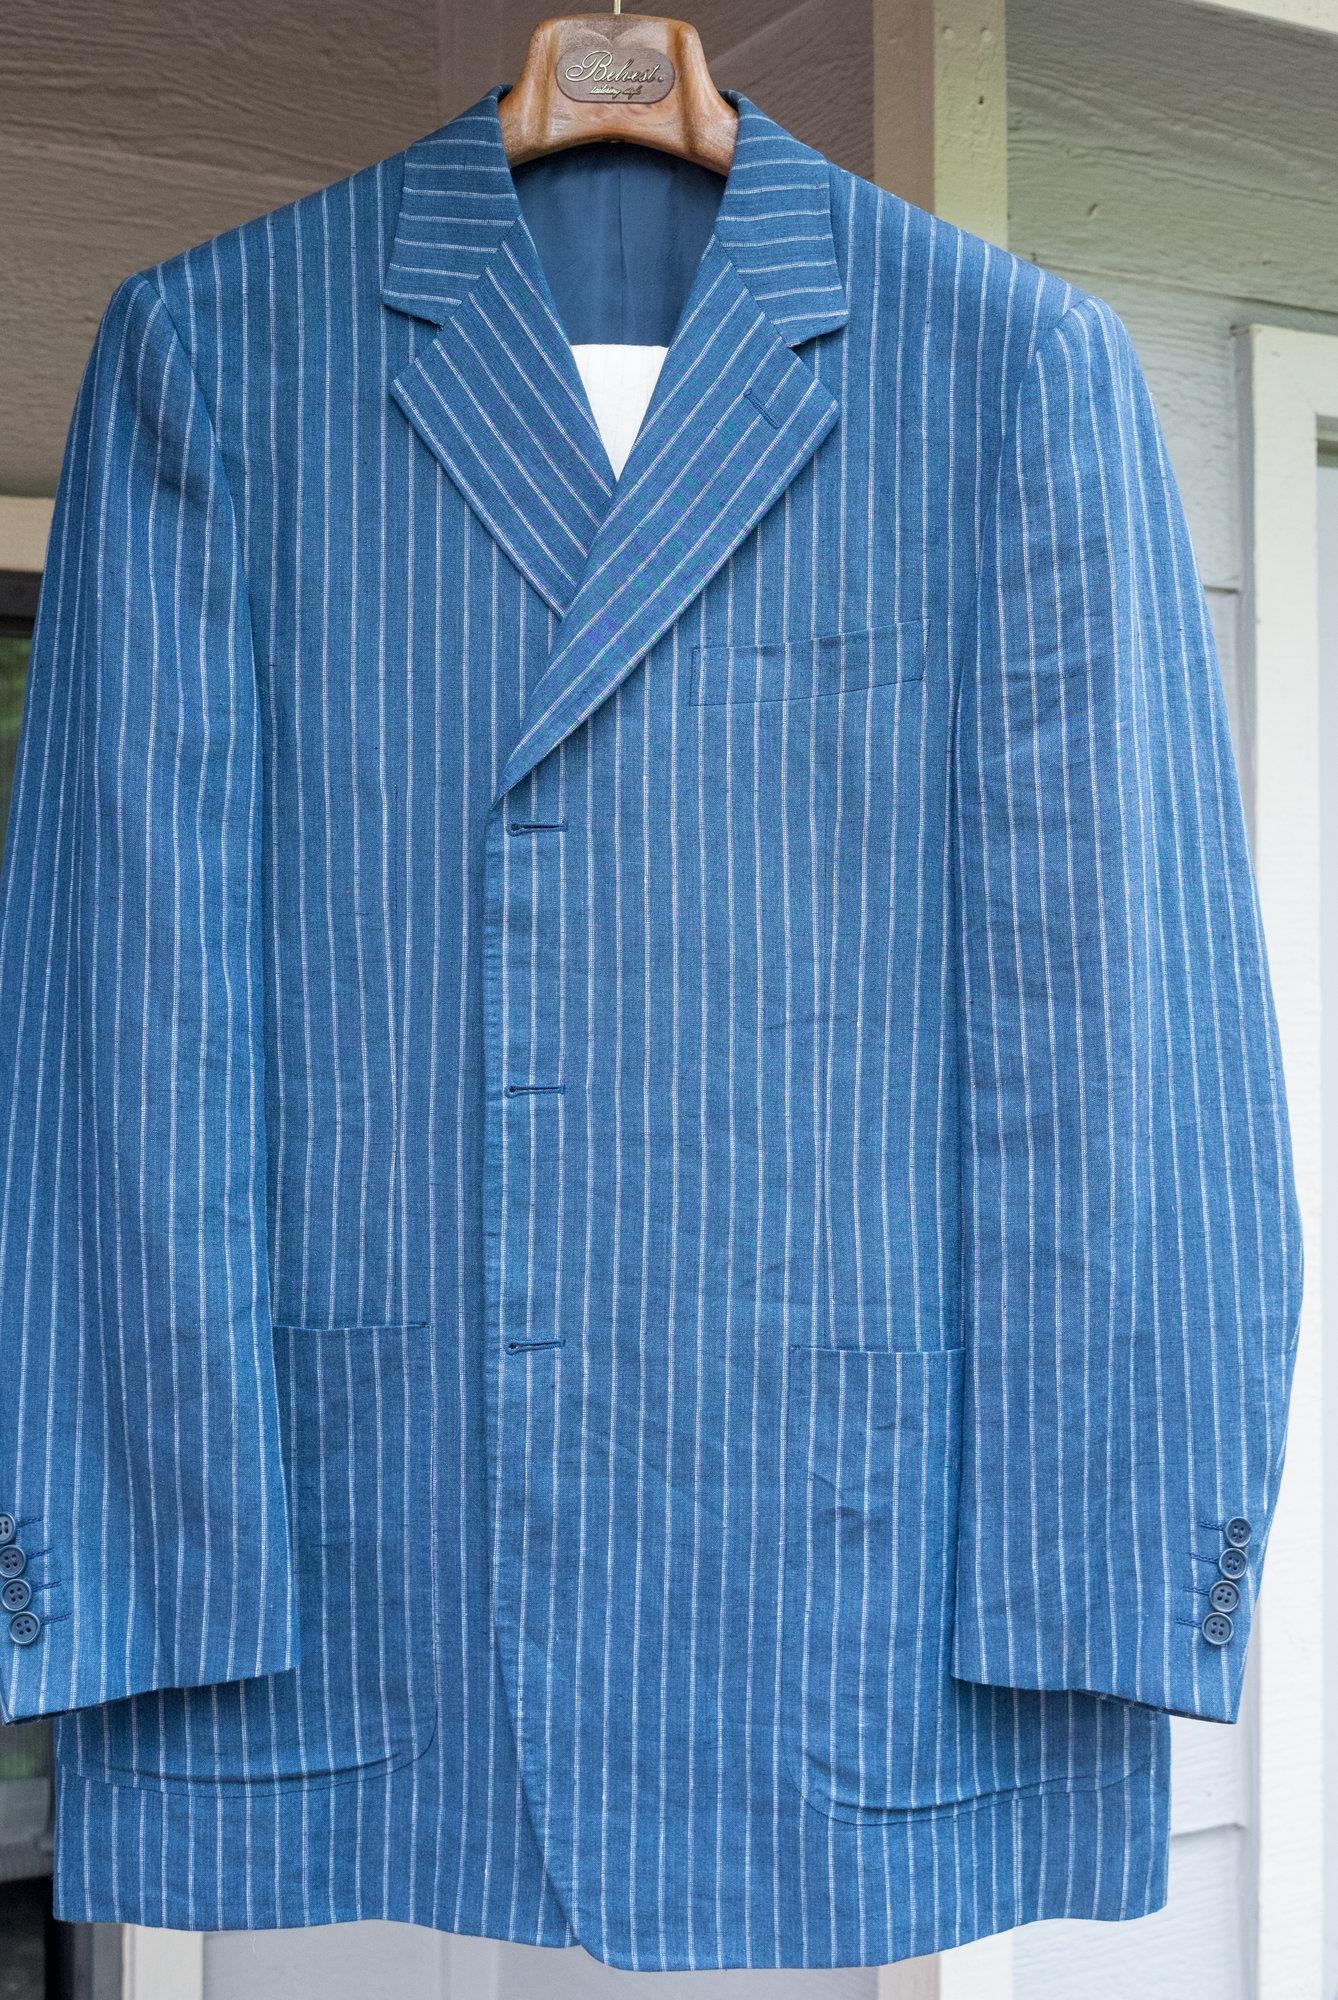 Canali 52 L 100% Linen Pinstripe Jacket.jpg